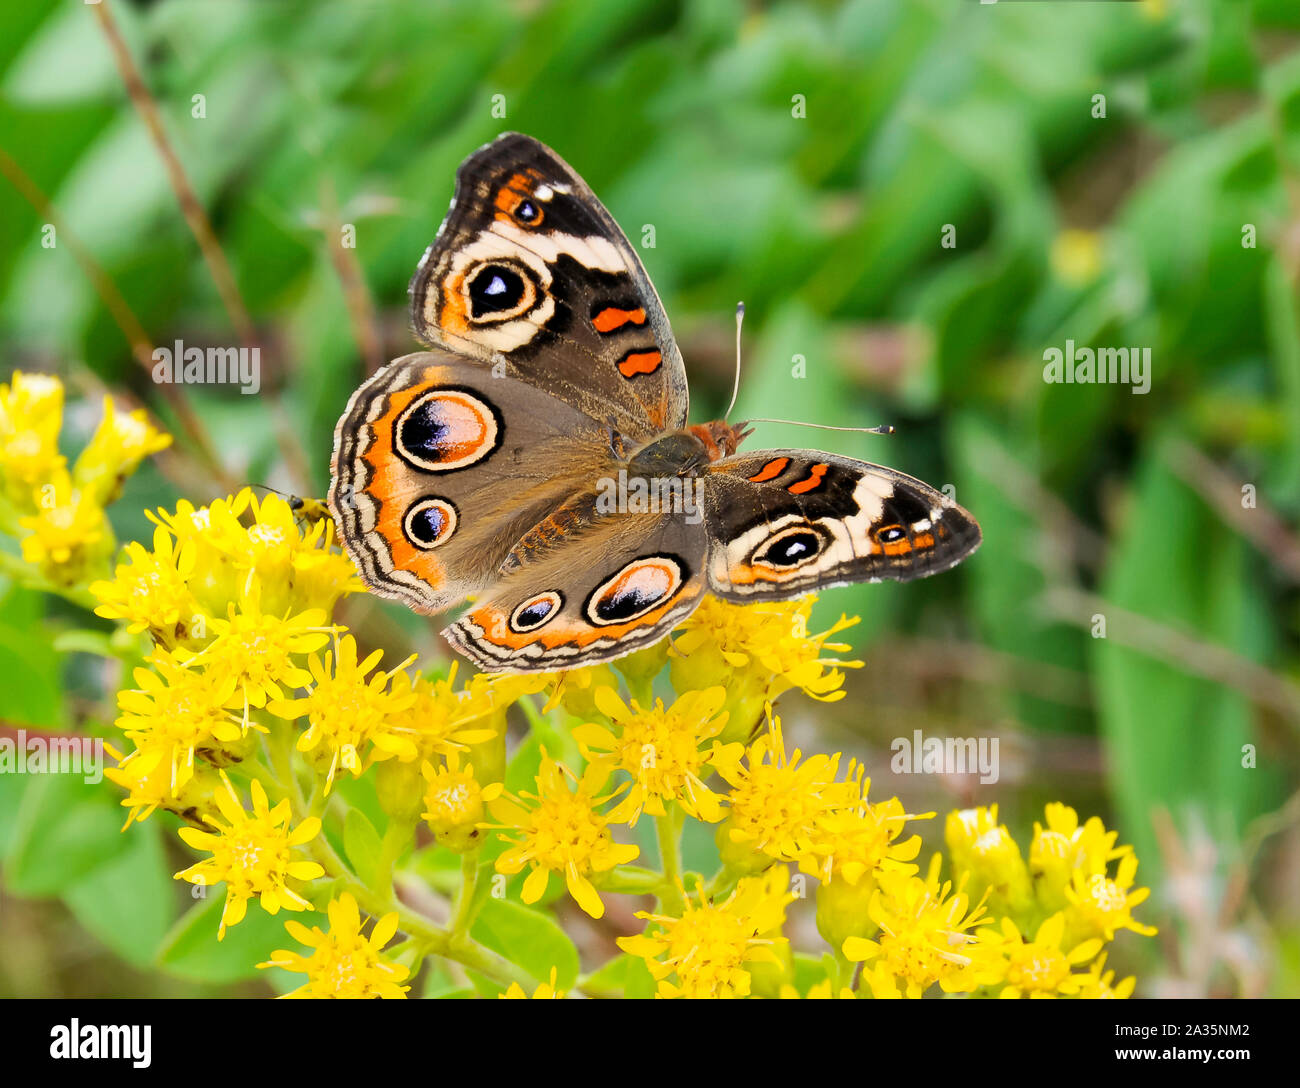 A beautiful common buckeye butterfly feeding on yellow flowers. Stock Photo